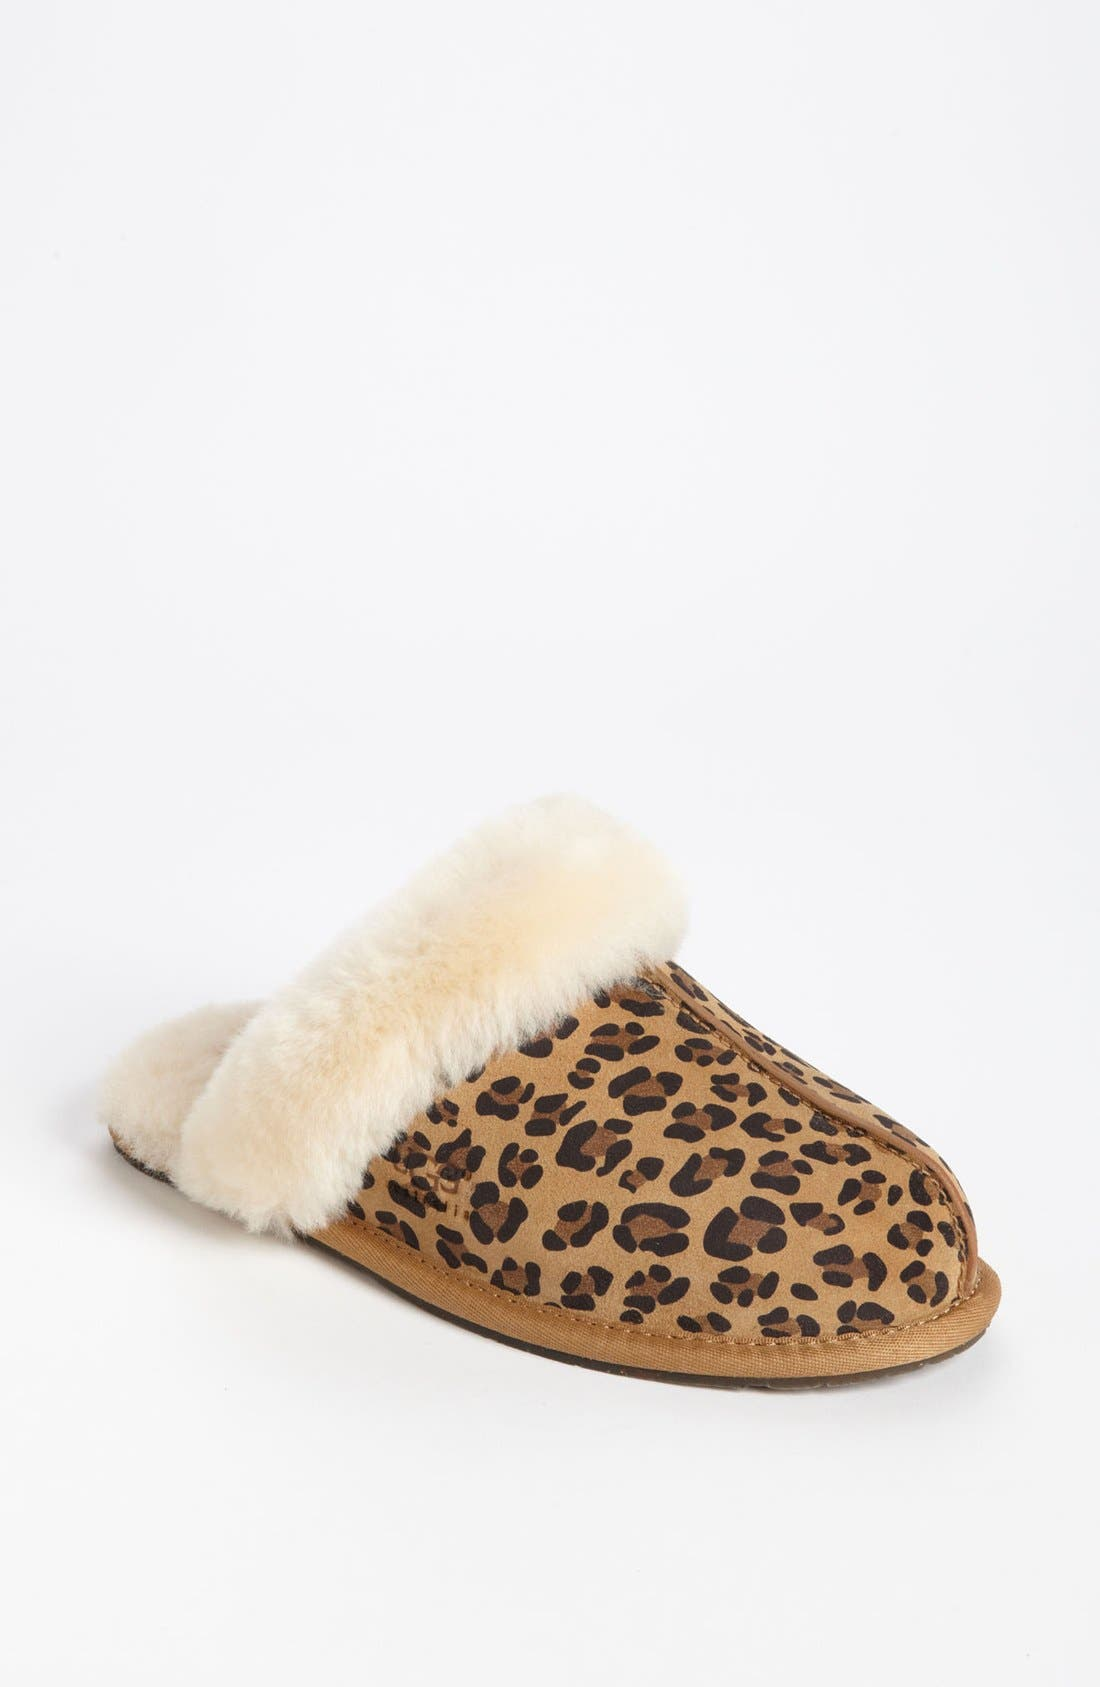 Alternate Image 1 Selected - UGG® Australia 'Scuffette II - Leopard' Slipper (Women)